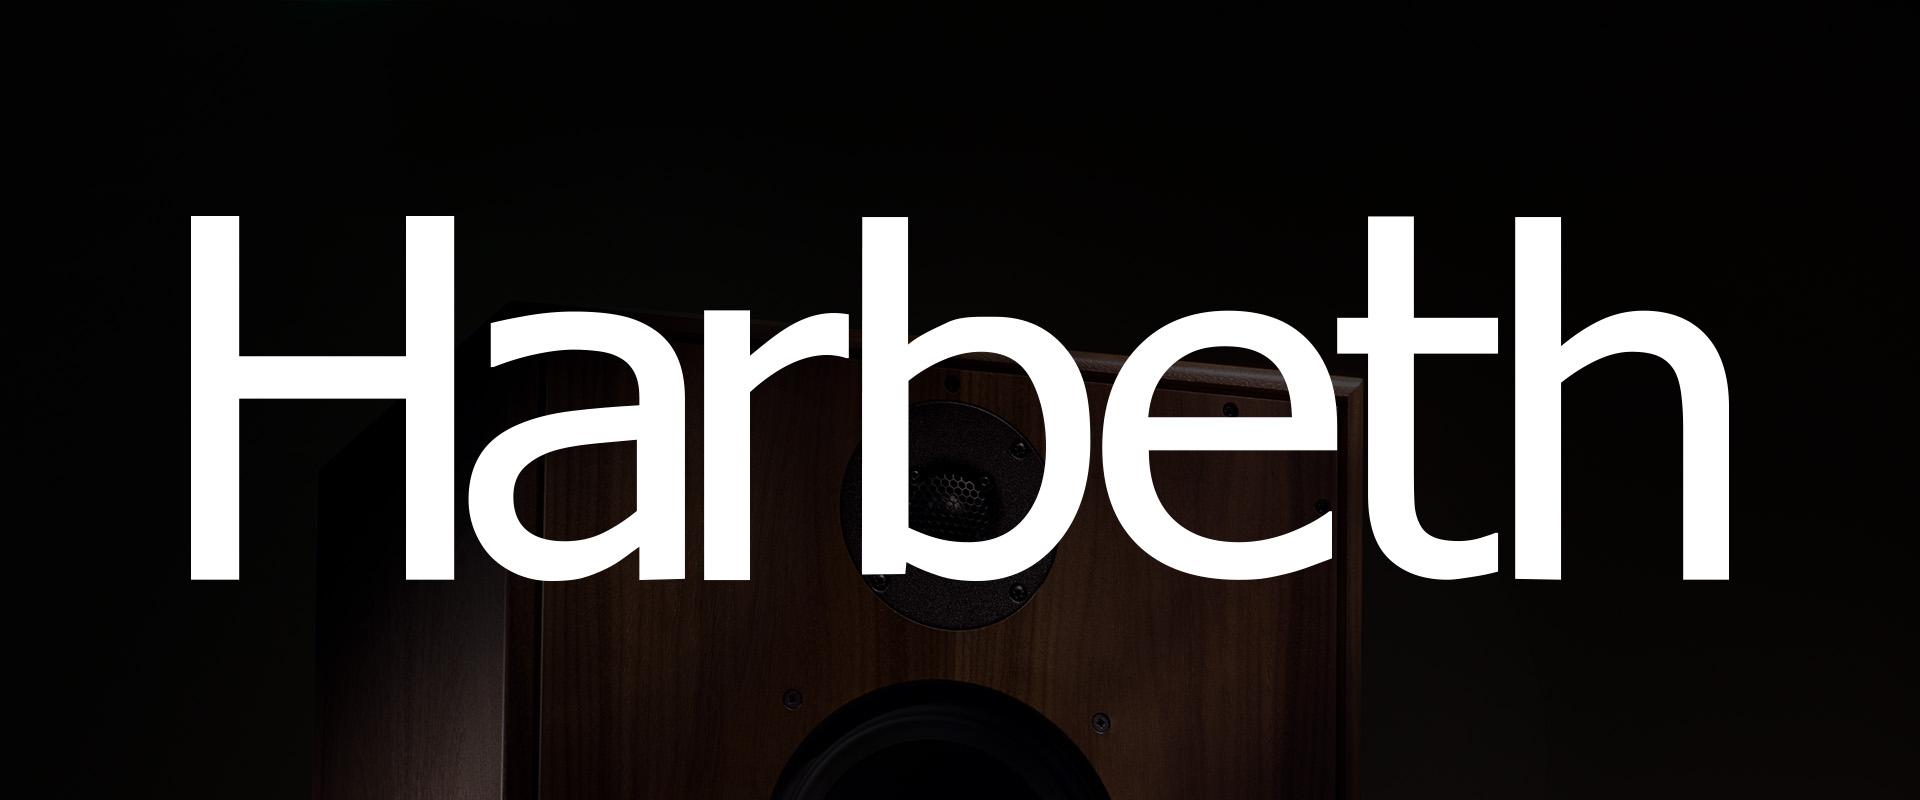 Harbeth - Chattelin Audio Systems